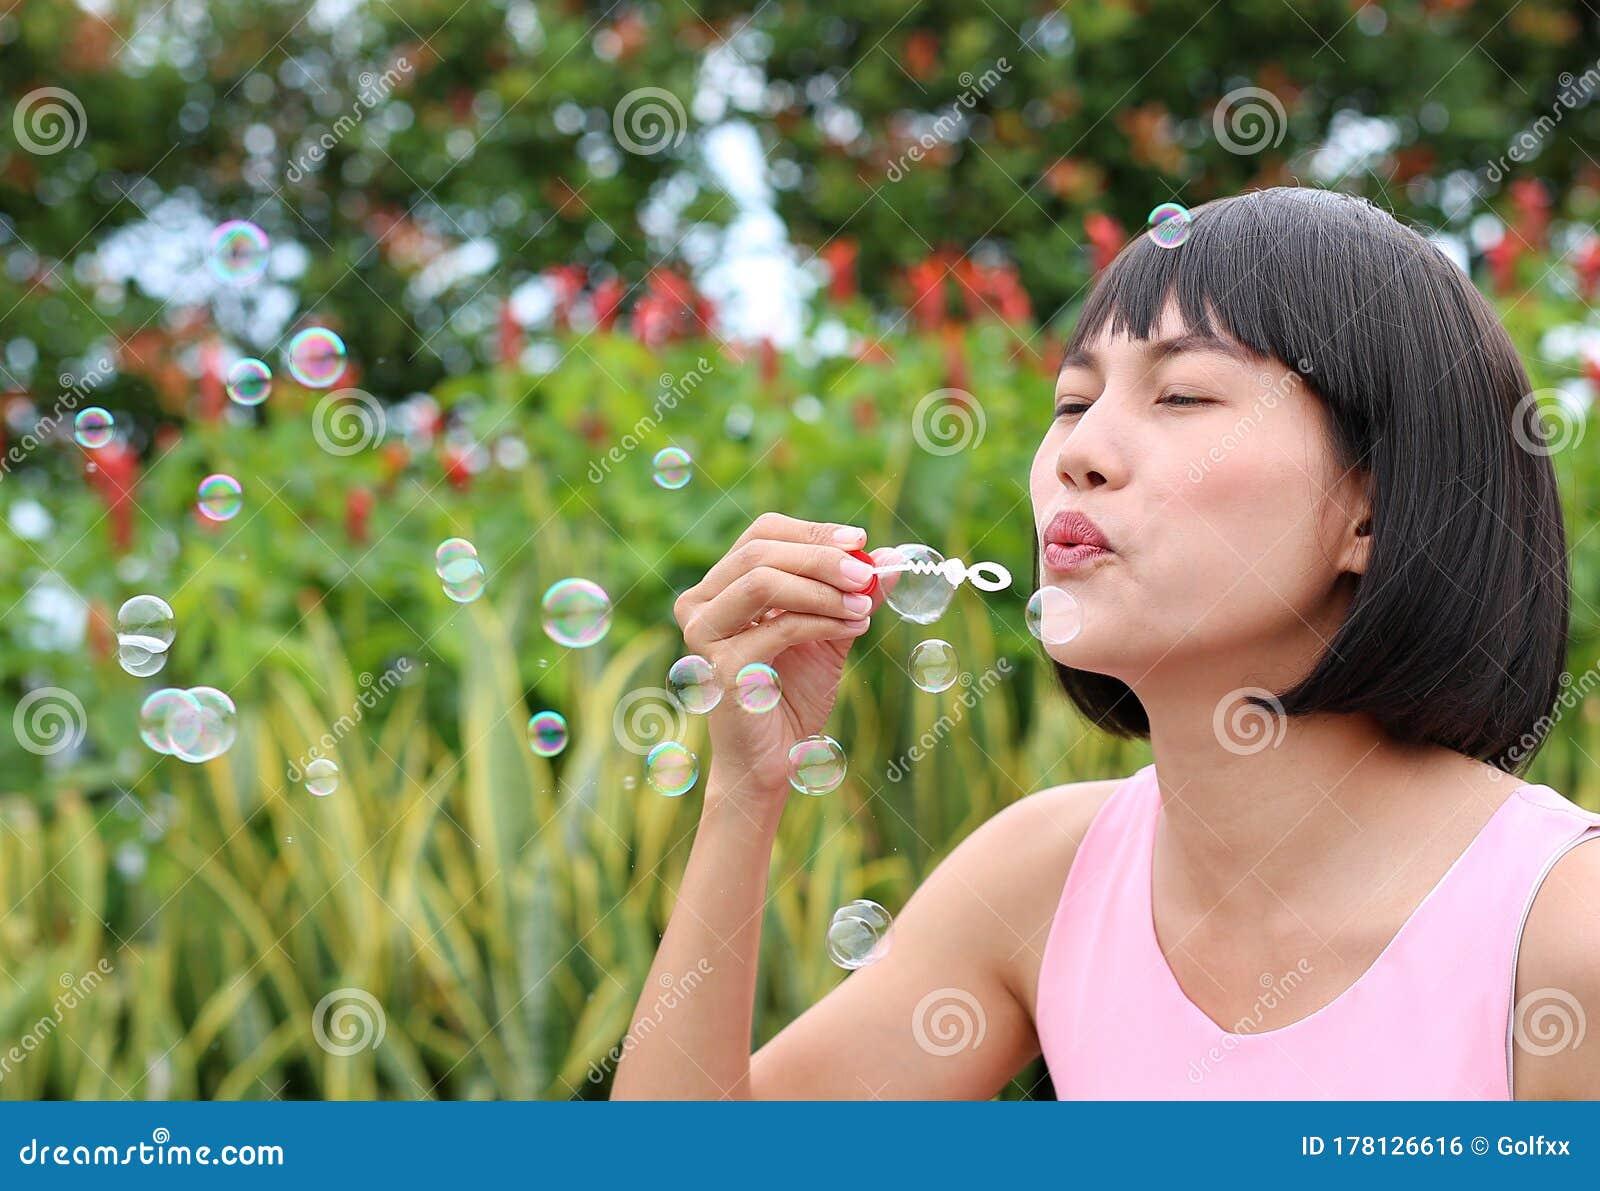 bubble outdoor wanking Asian